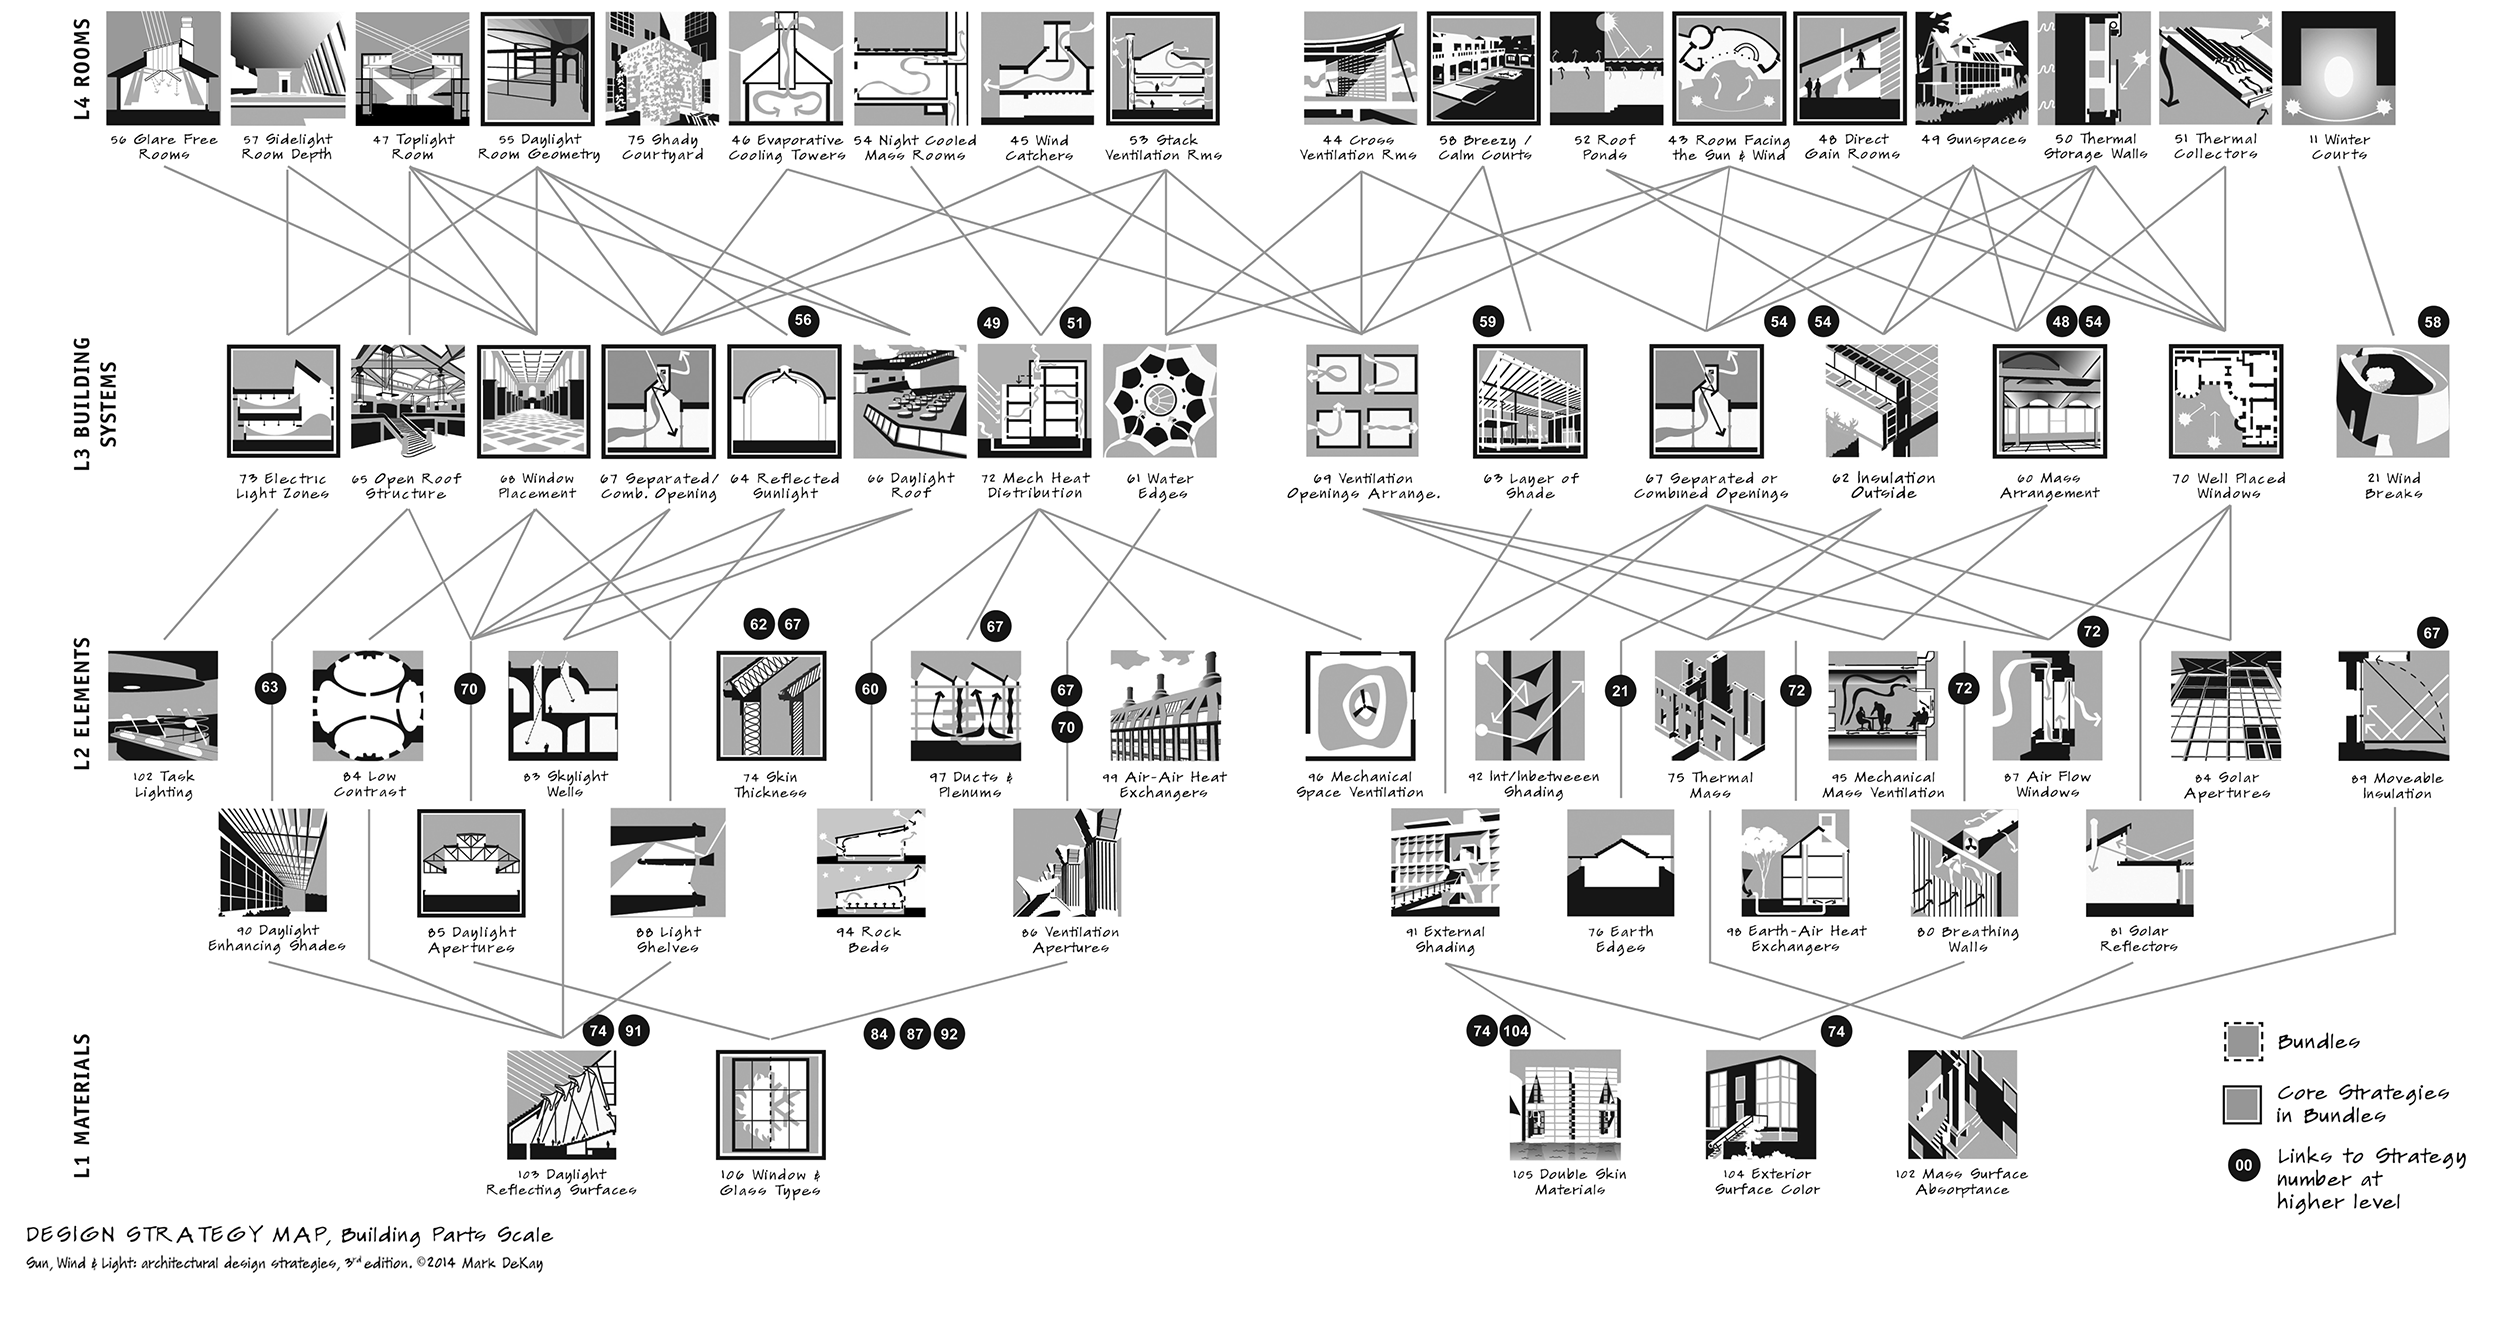 Design Strategy Maps: Bldg Parts